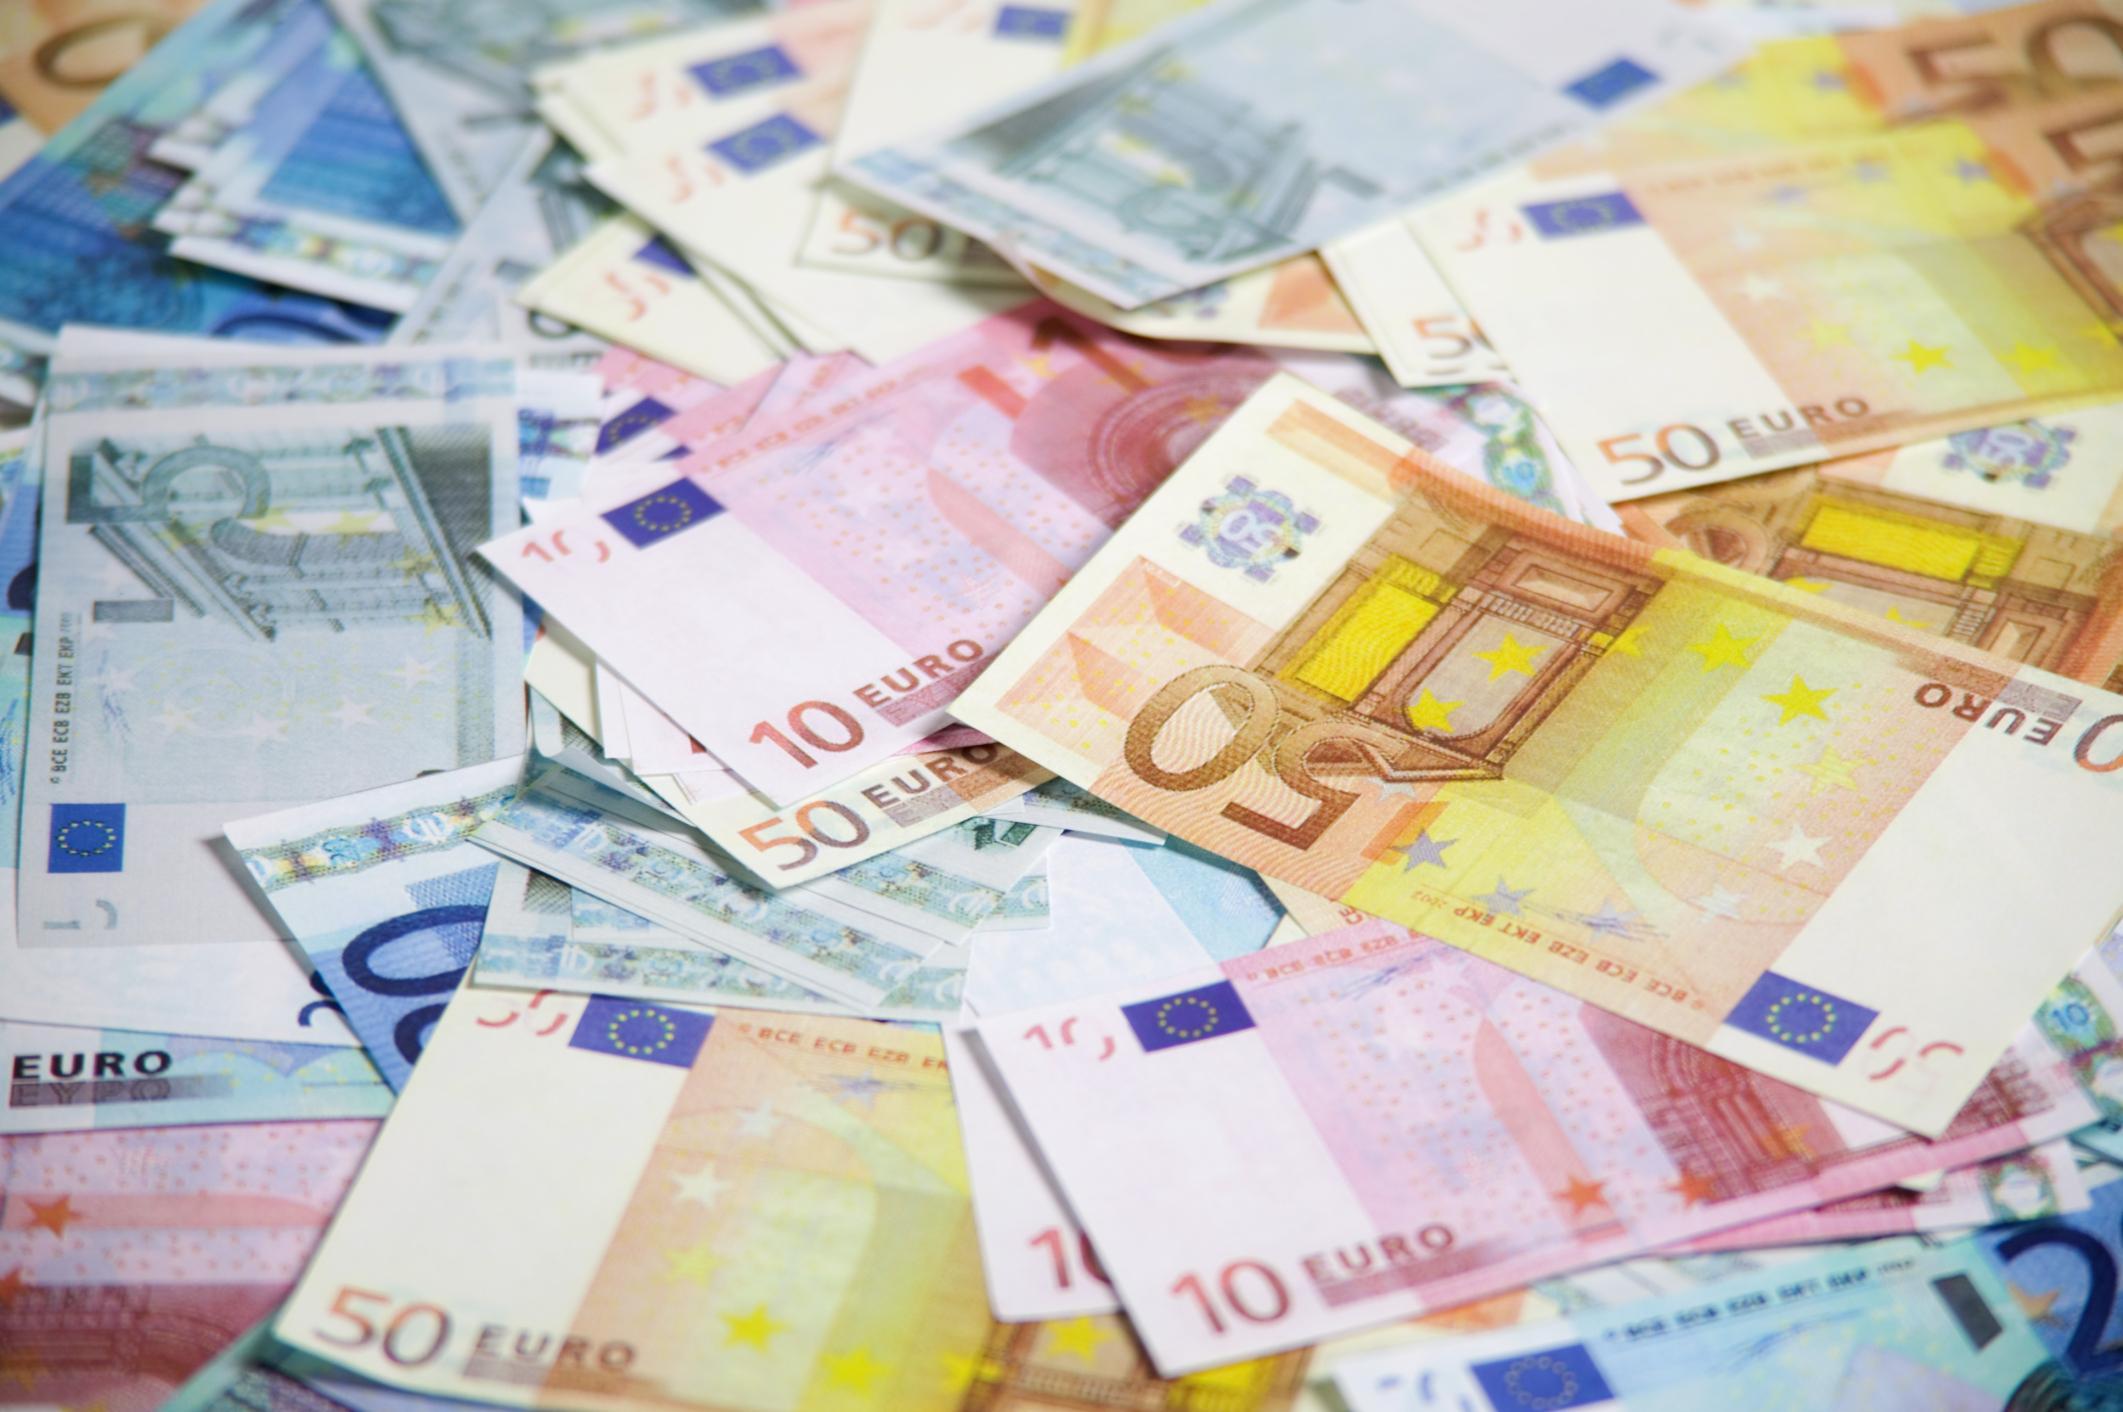 MEVDUATLARDA 956 MİLYON EURO'LUK AZALMA